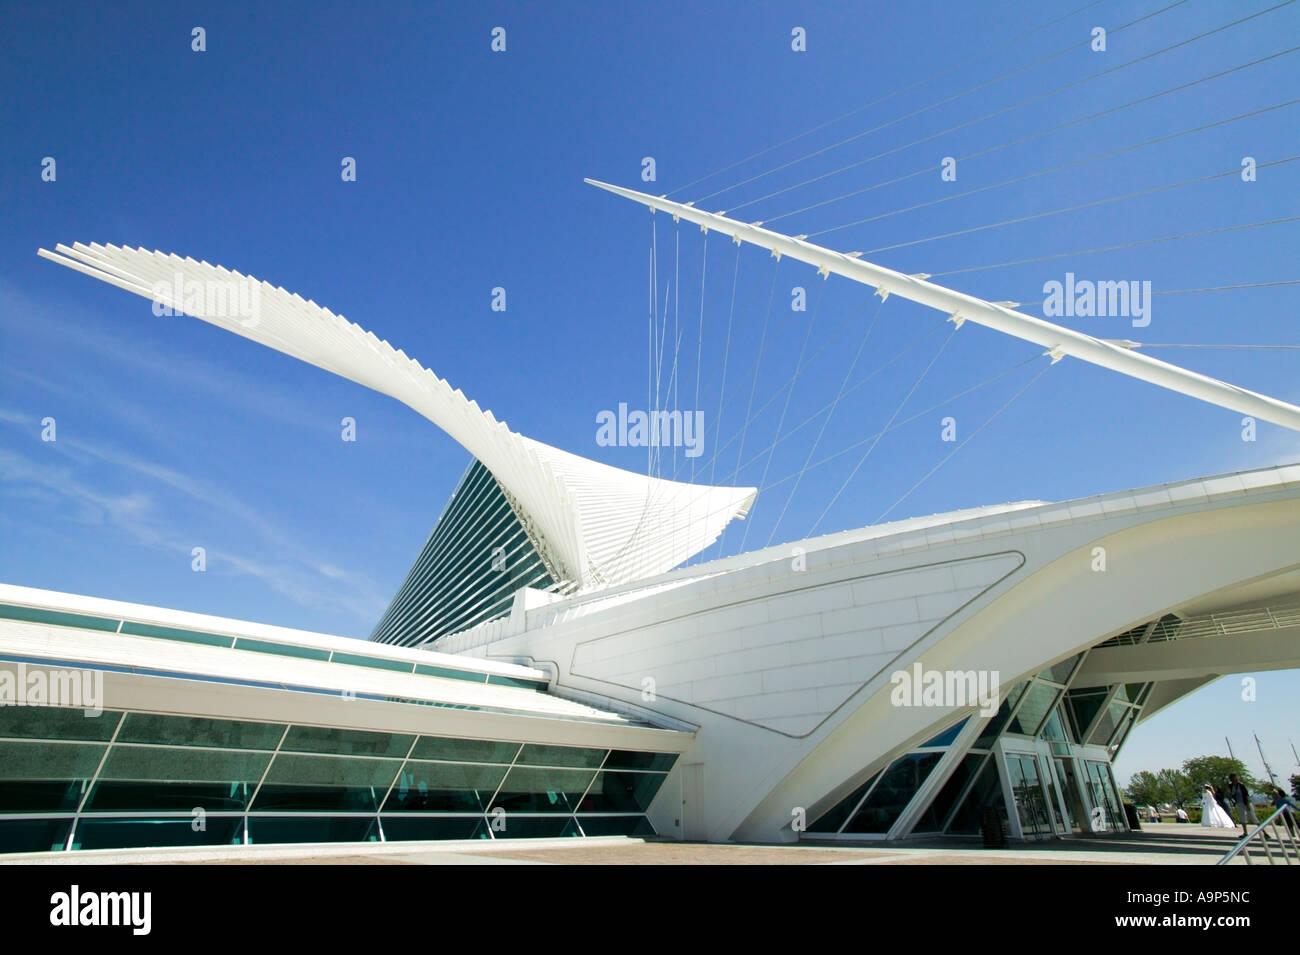 Calatrava ala del Museo de Arte de Milwaukee Milwaukee, Wisconsin, EE.UU. Imagen De Stock